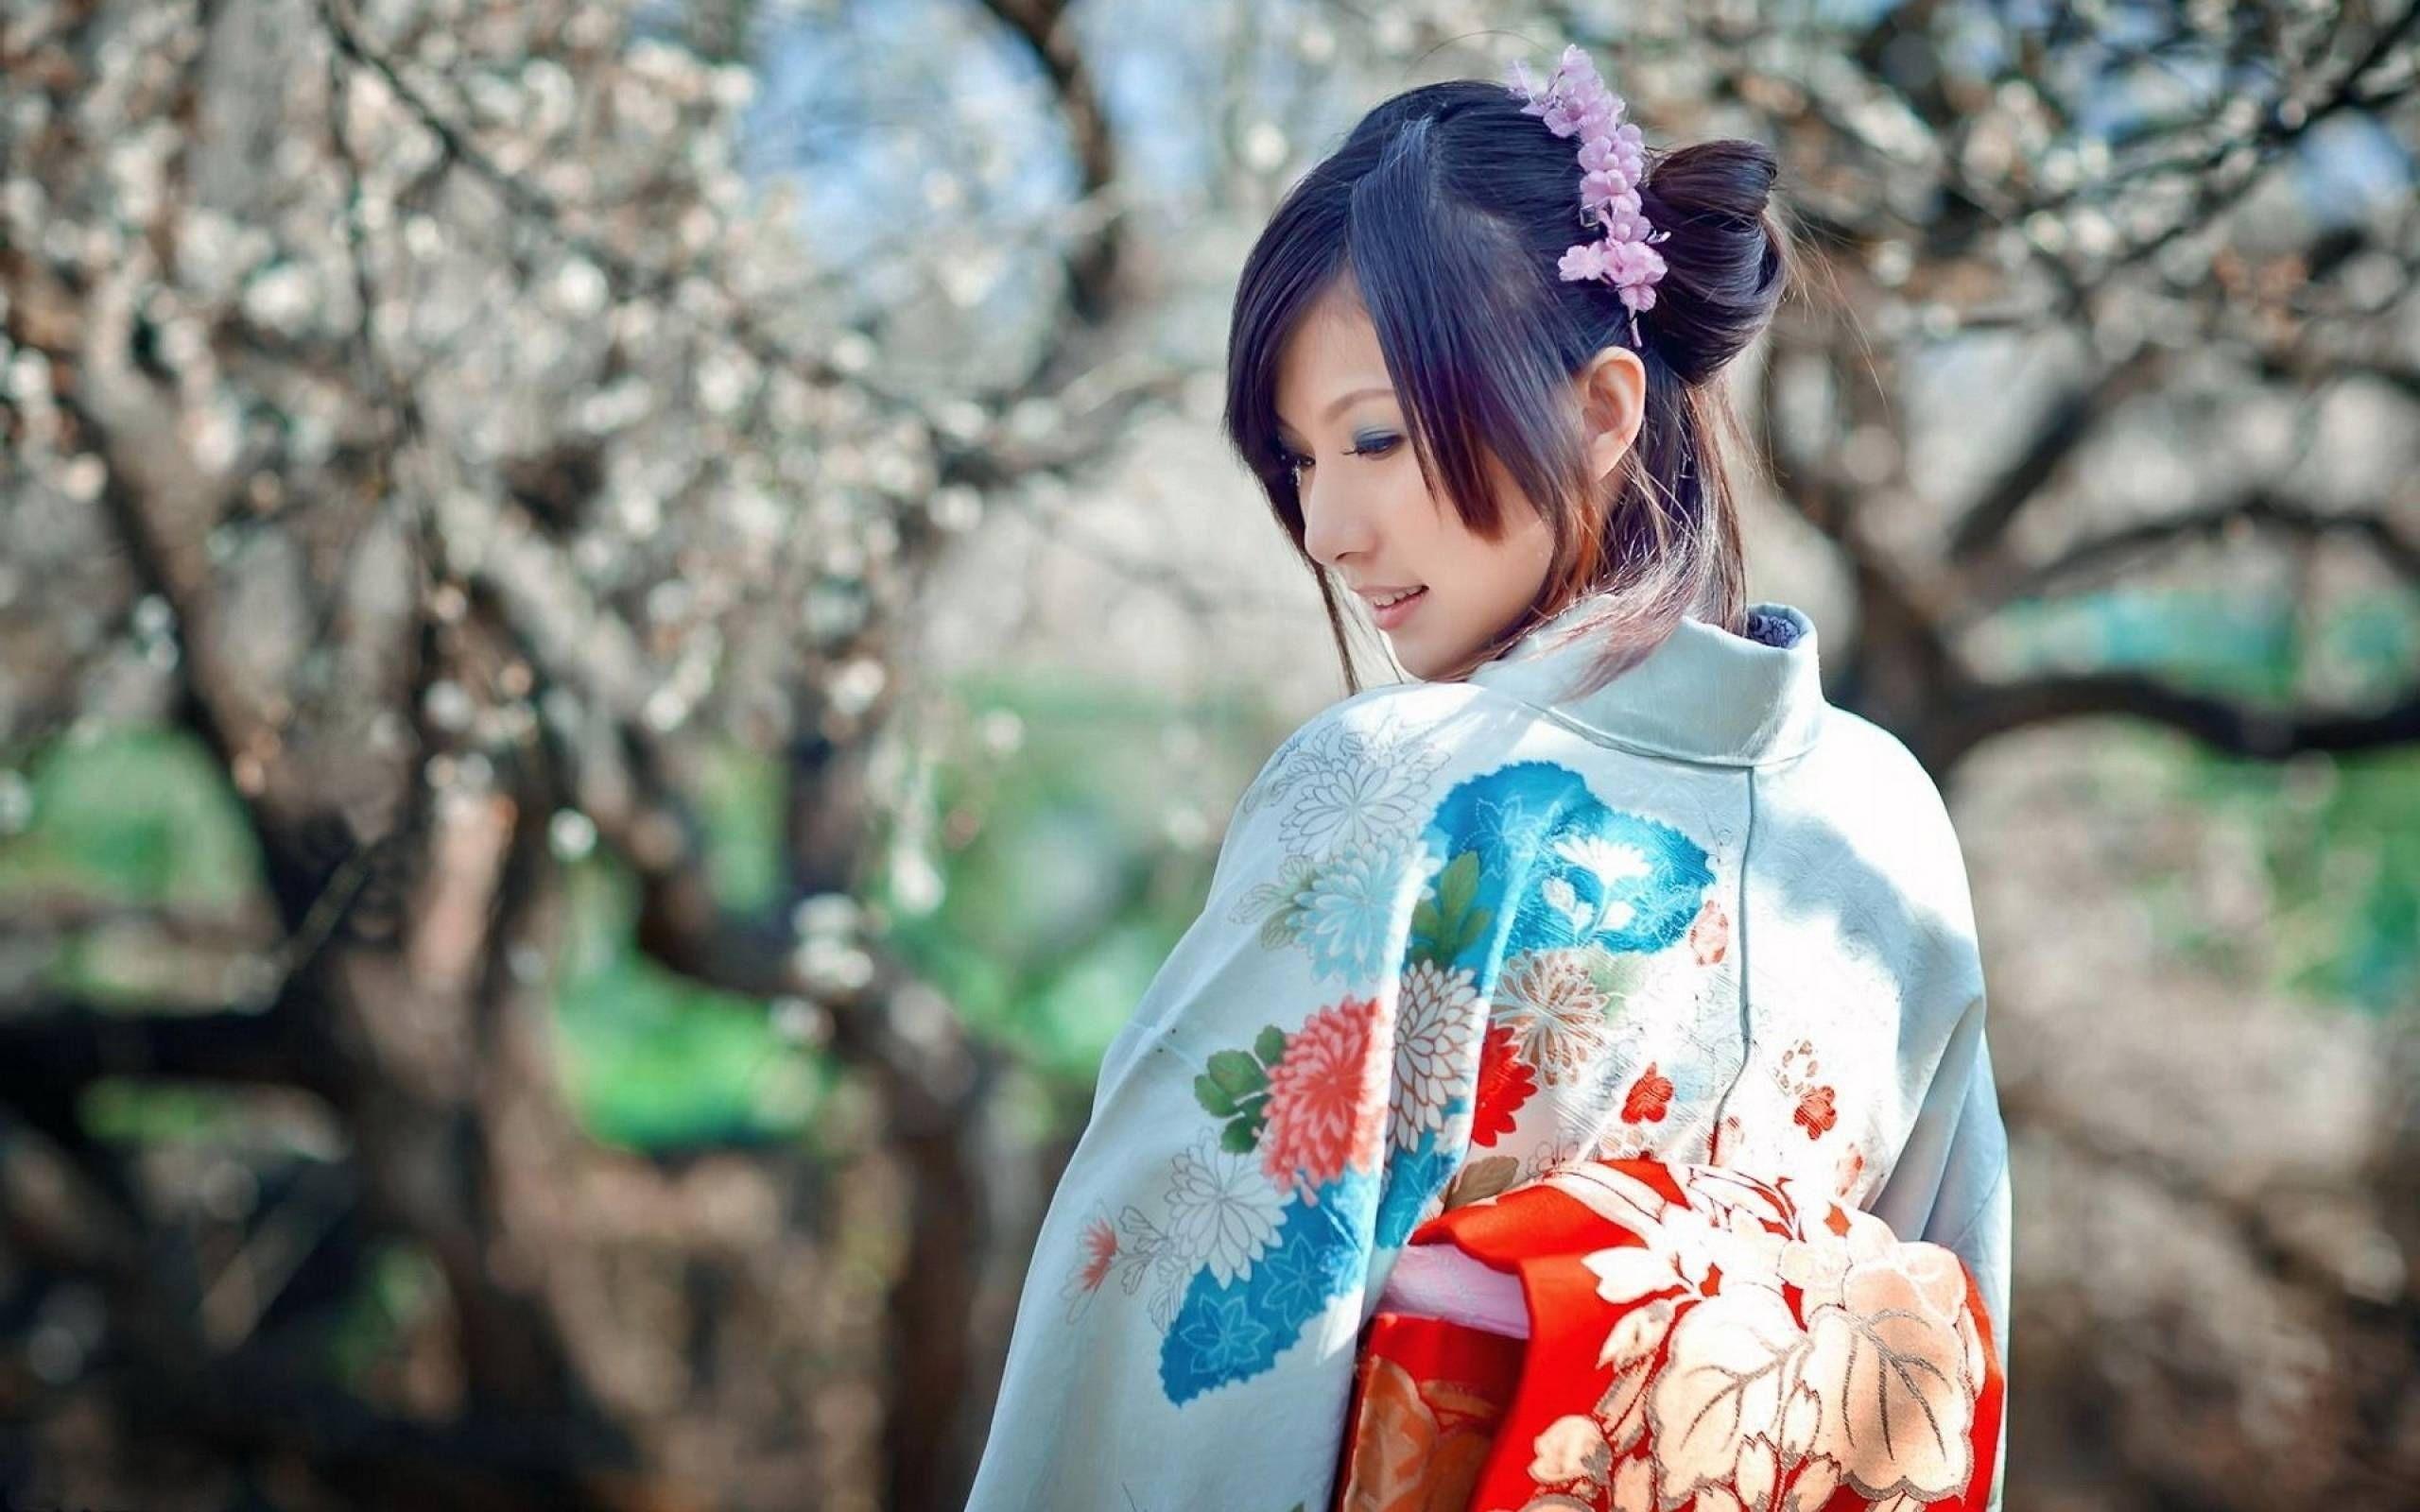 Res: 2560x1600, Kimono Wallpapers, Kimono Backgrounds for PC - 100% Quality HD